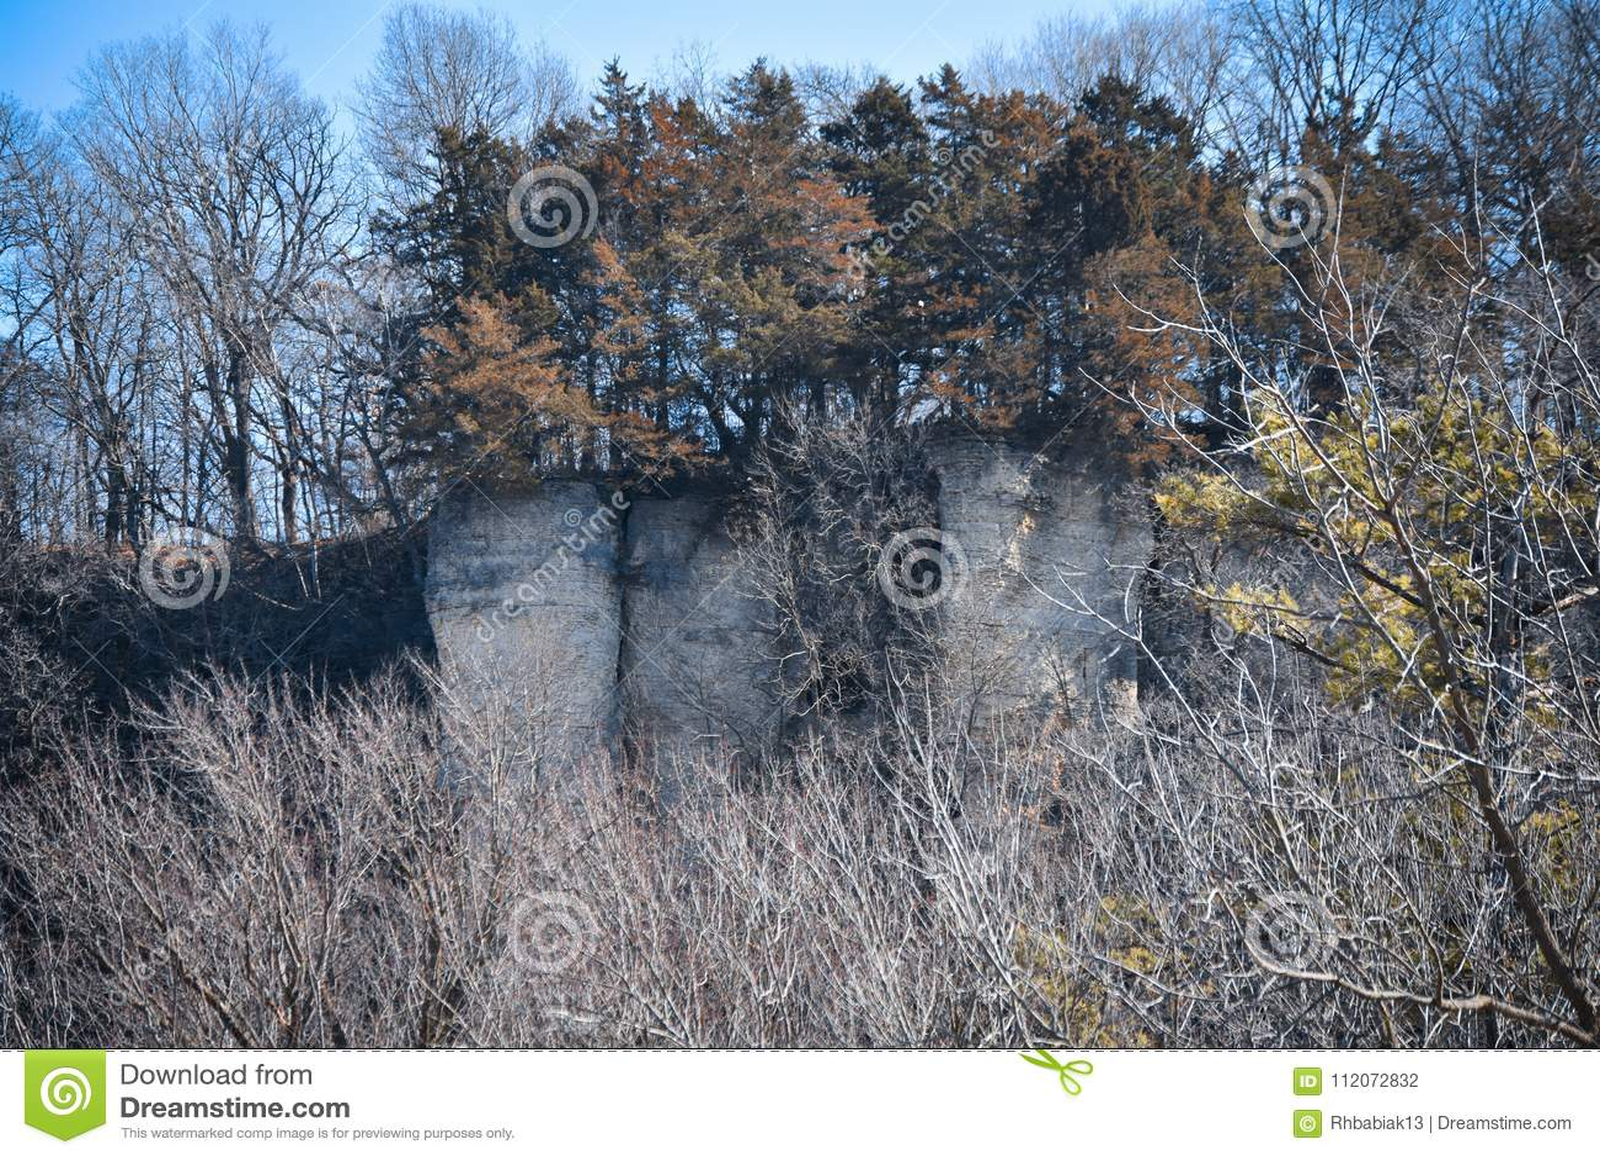 Evergreens On Top Of Cliff In Decorah, Iowa Stock Photo